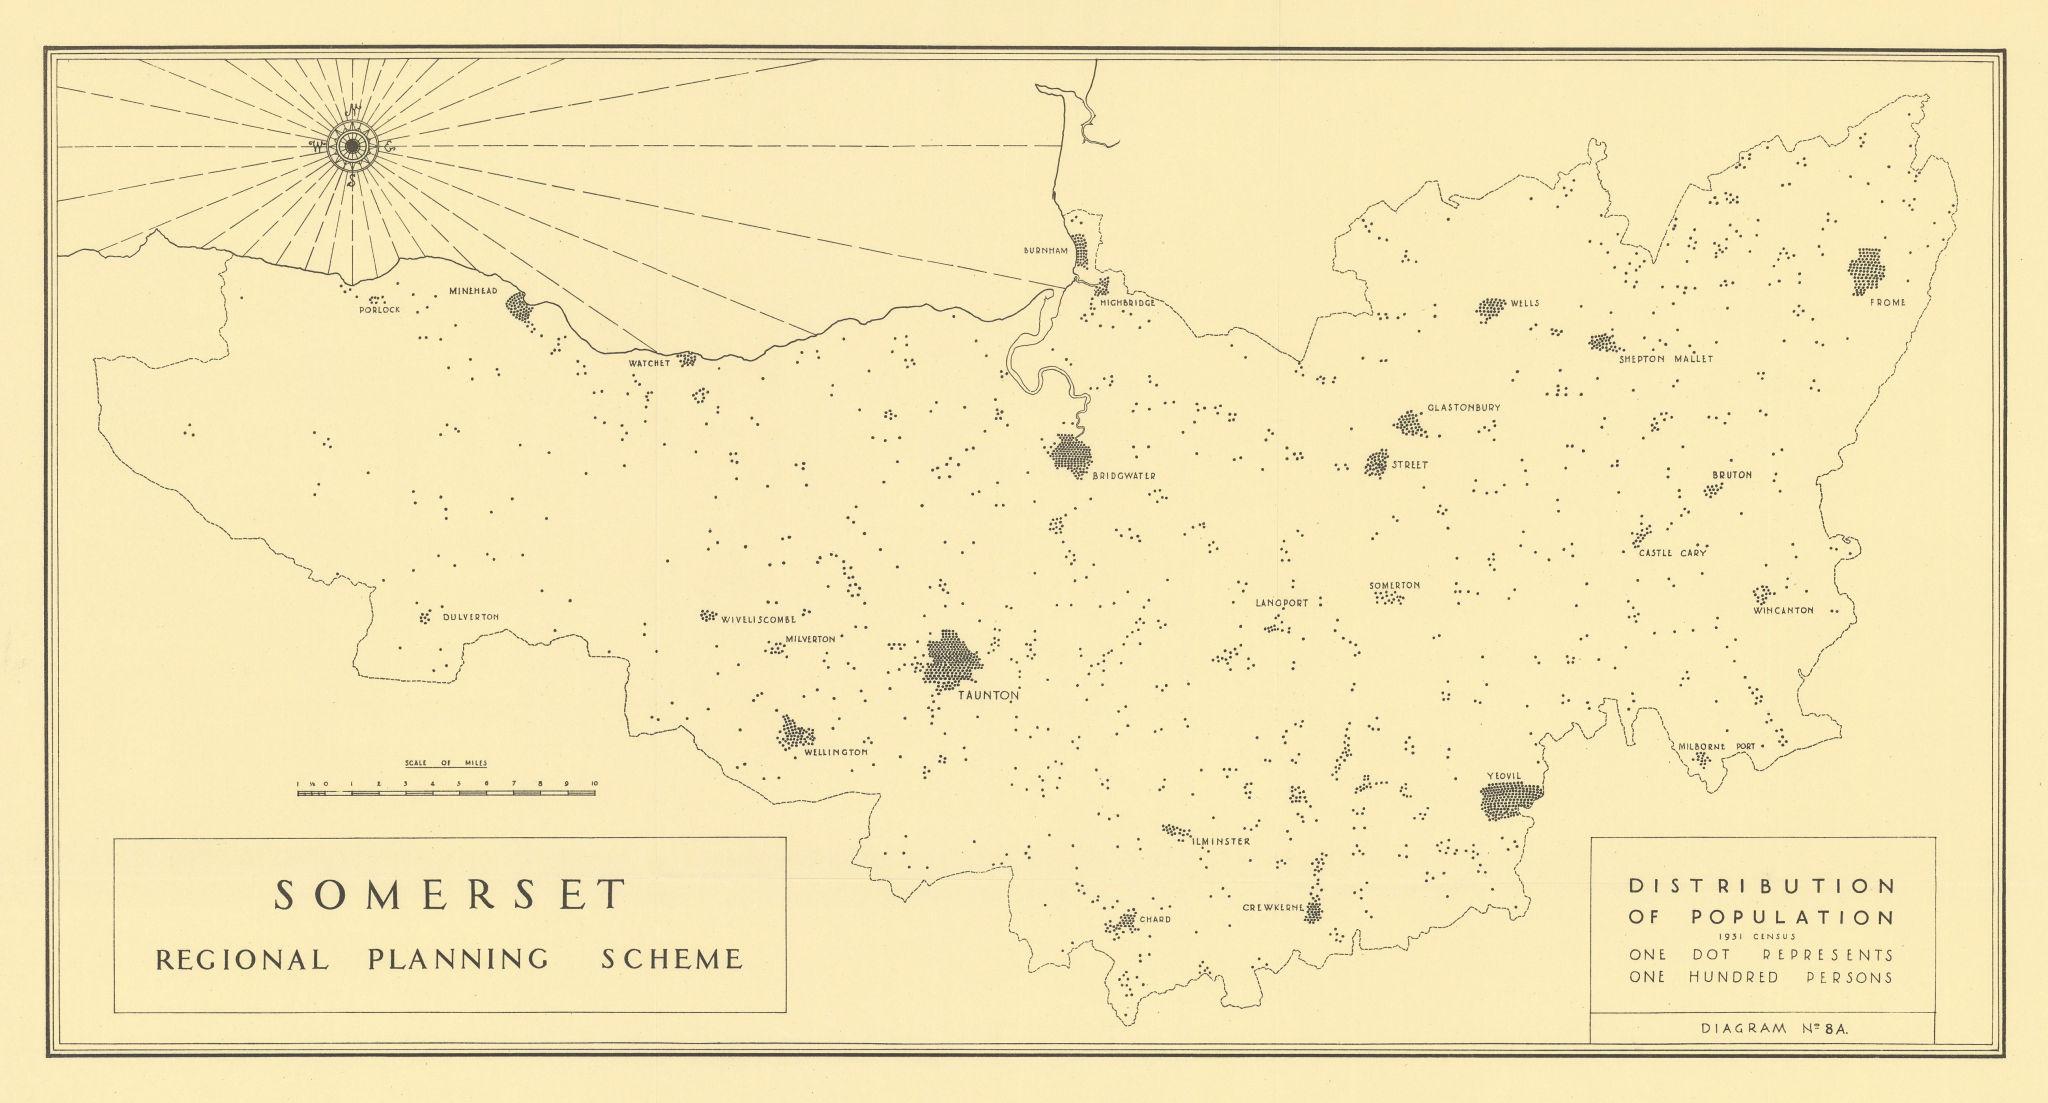 Somerset regional plann population distribution 1931 census. THOMPSON 1934 map